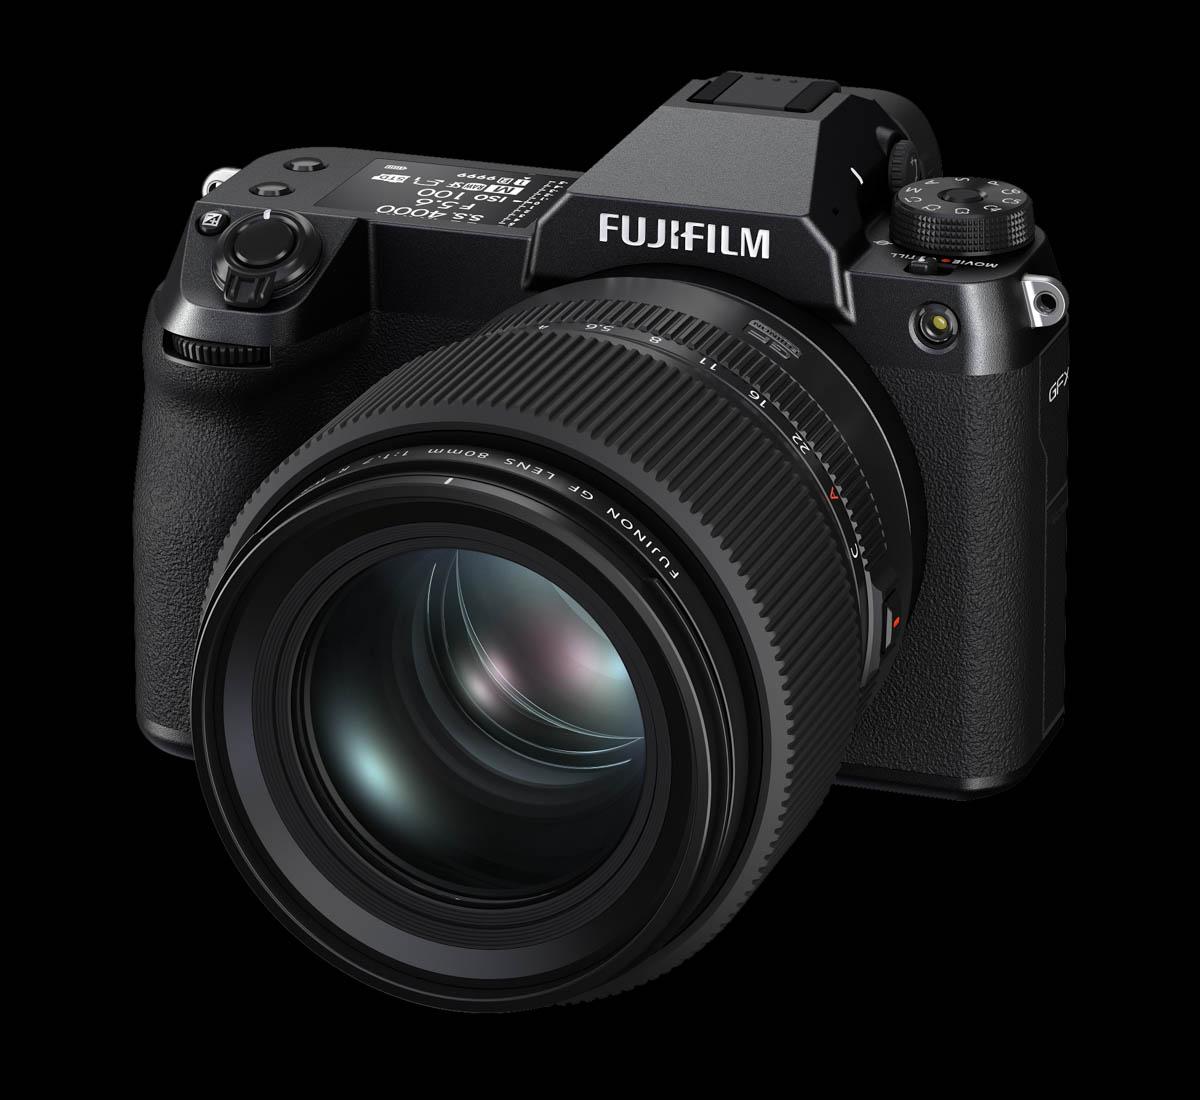 The New Fujifilm GFX100S 102MP Medium Format Camera